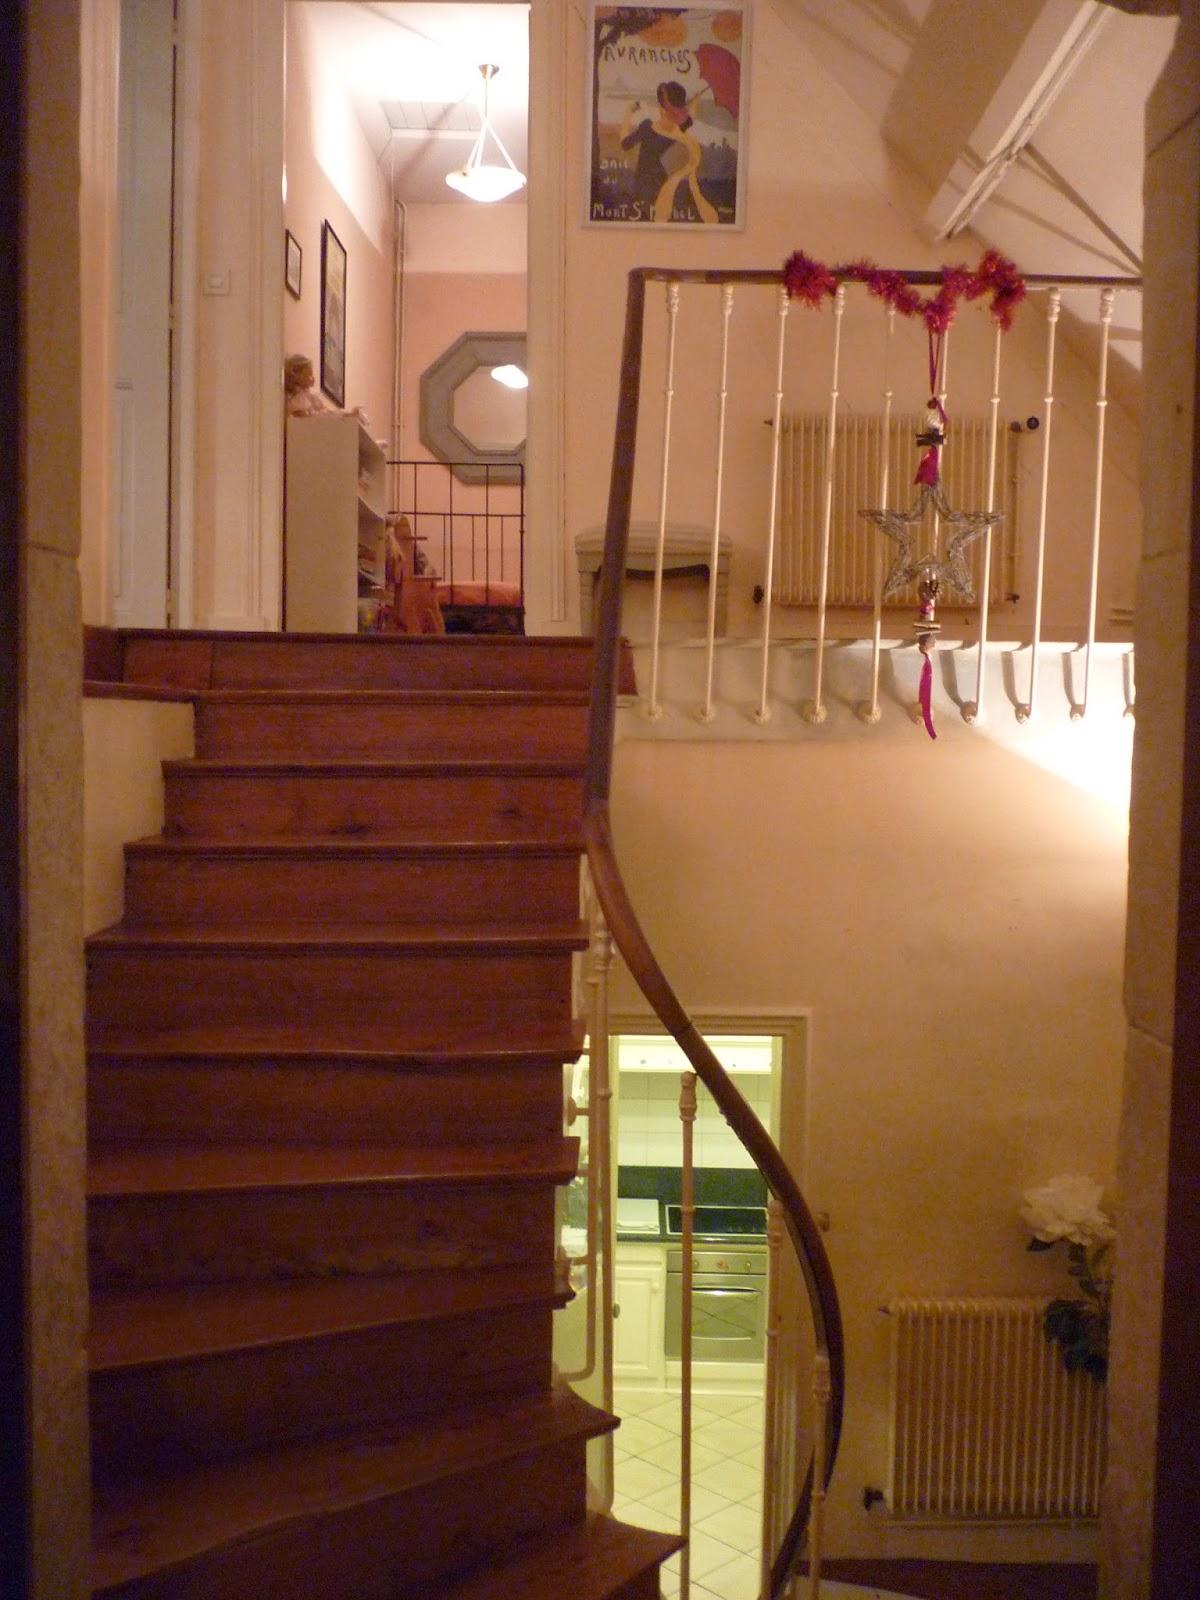 Escalier du Manoir de Beaurepaire en Normandie